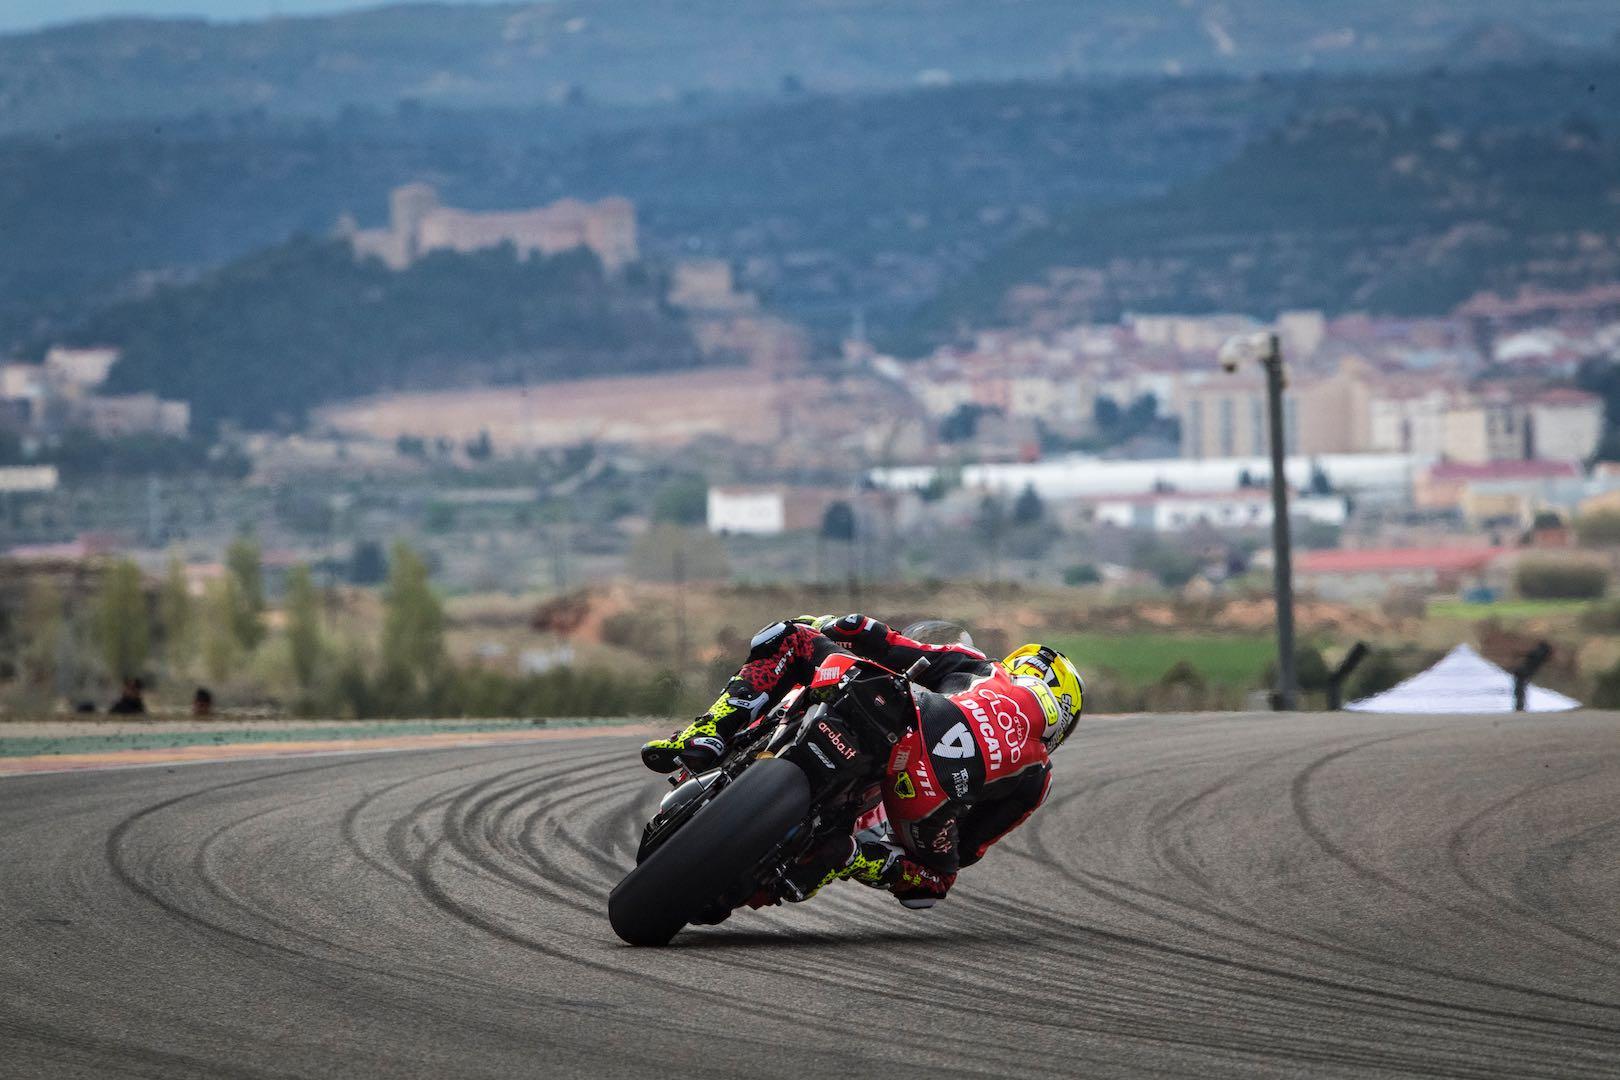 2019 Aragon WorldSBK: Bautista & Ducati #1 Once Again